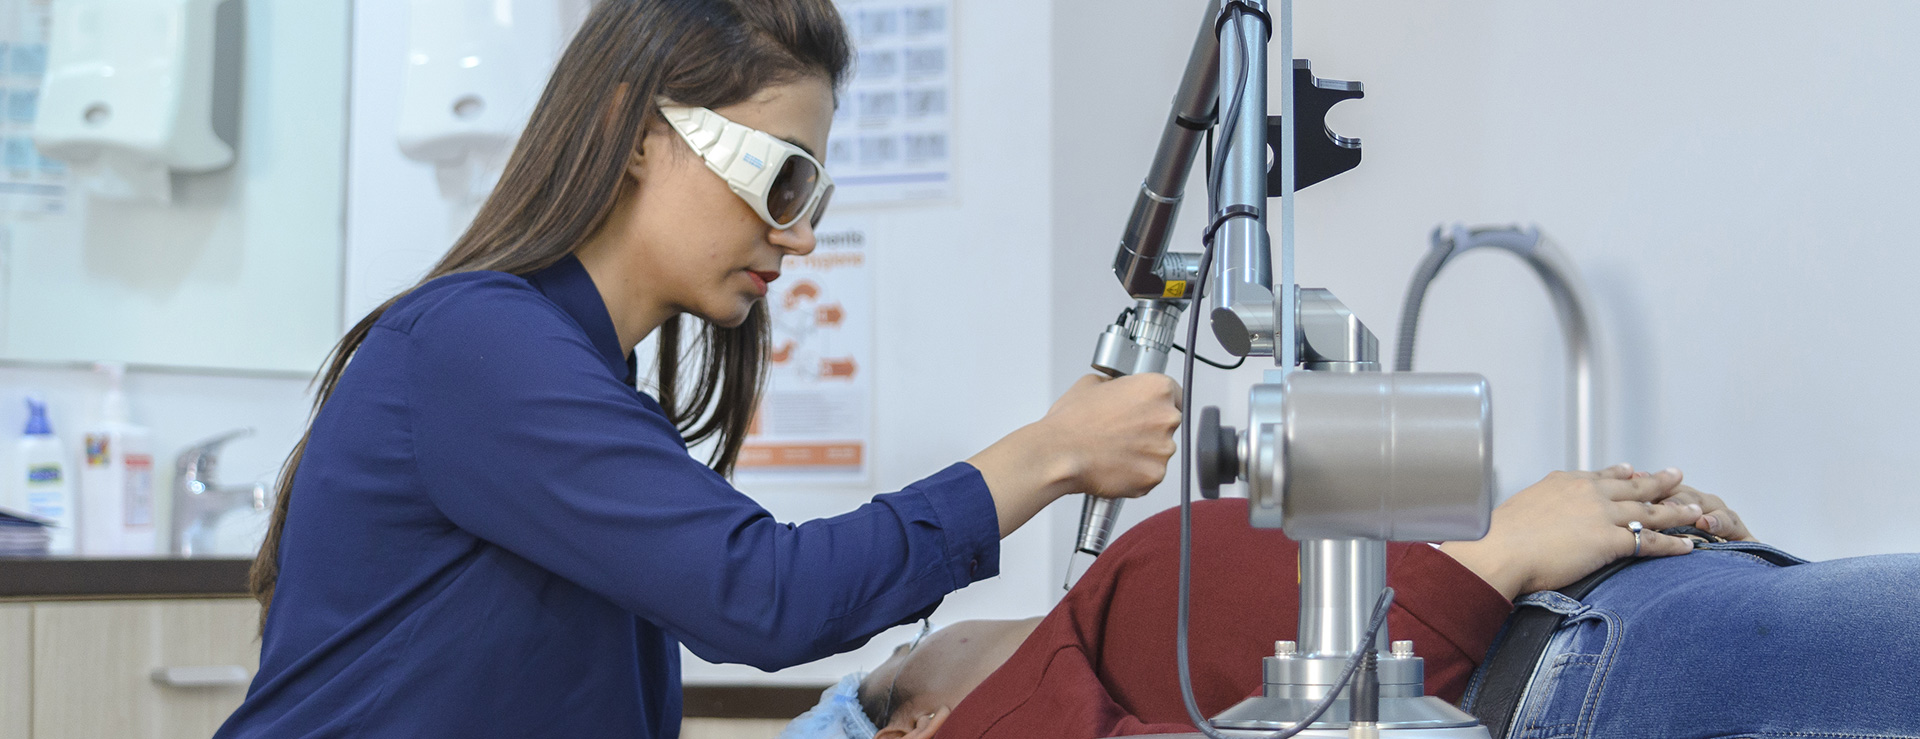 reconstructive-plastic-surgery-hospital-mumbai